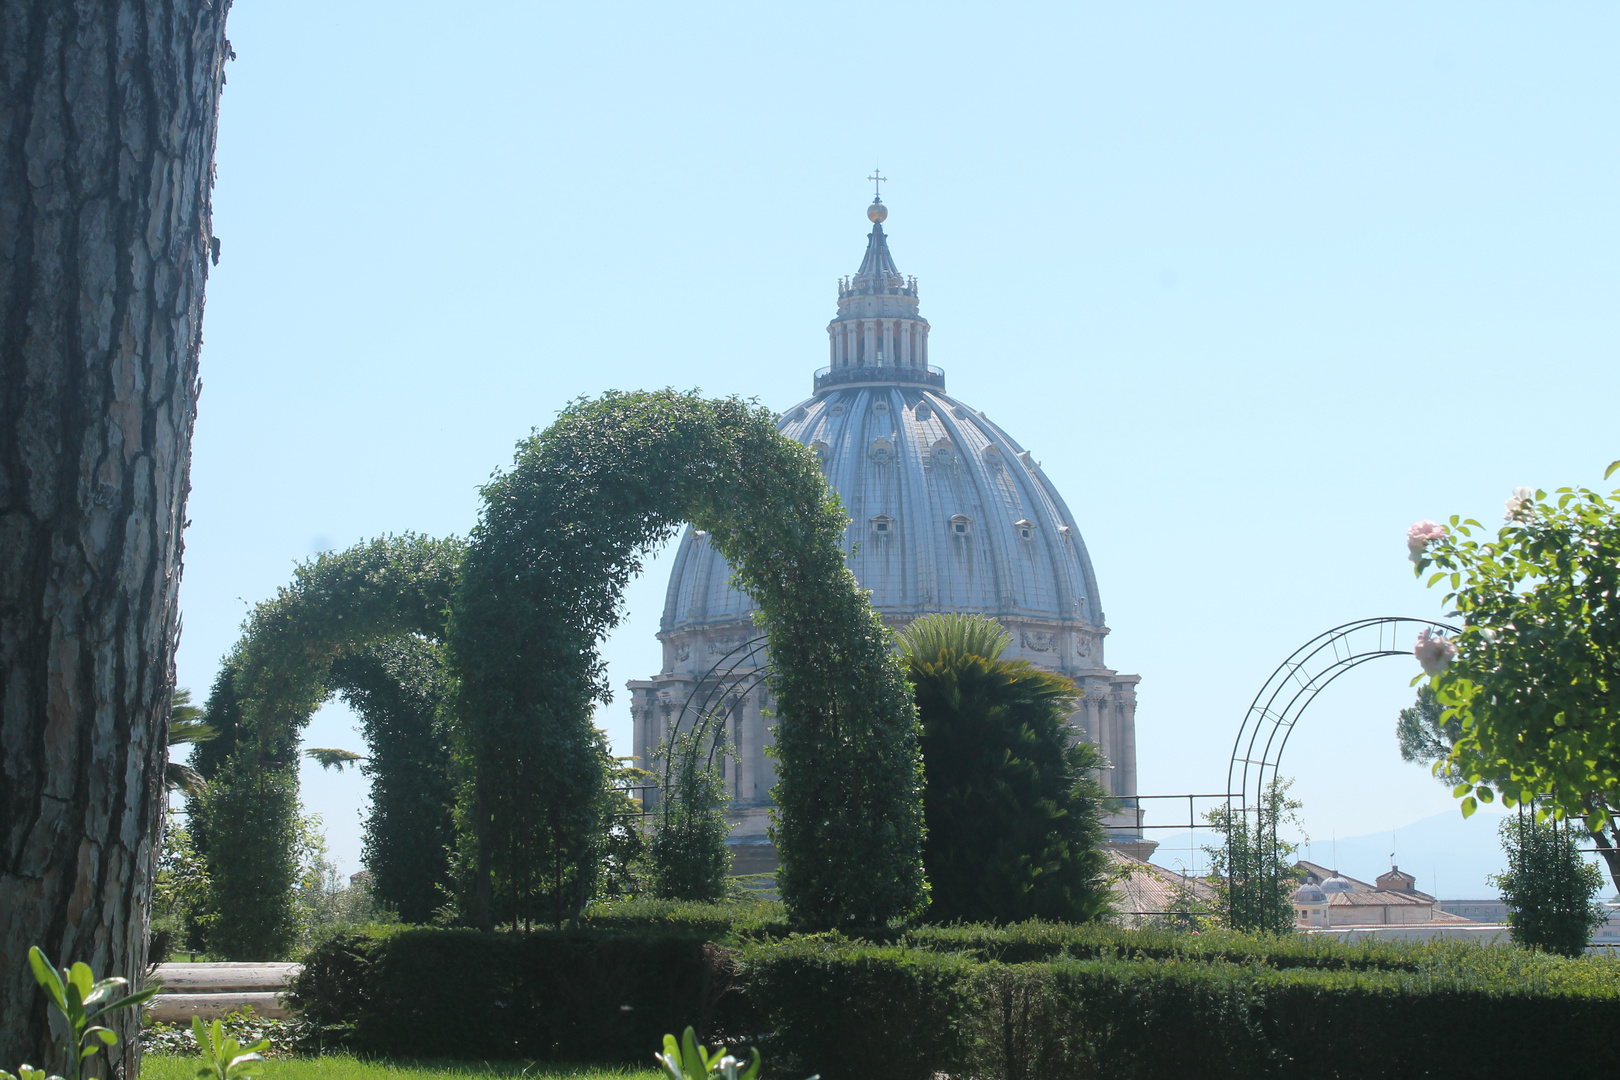 Dome seen from Vatican Garden